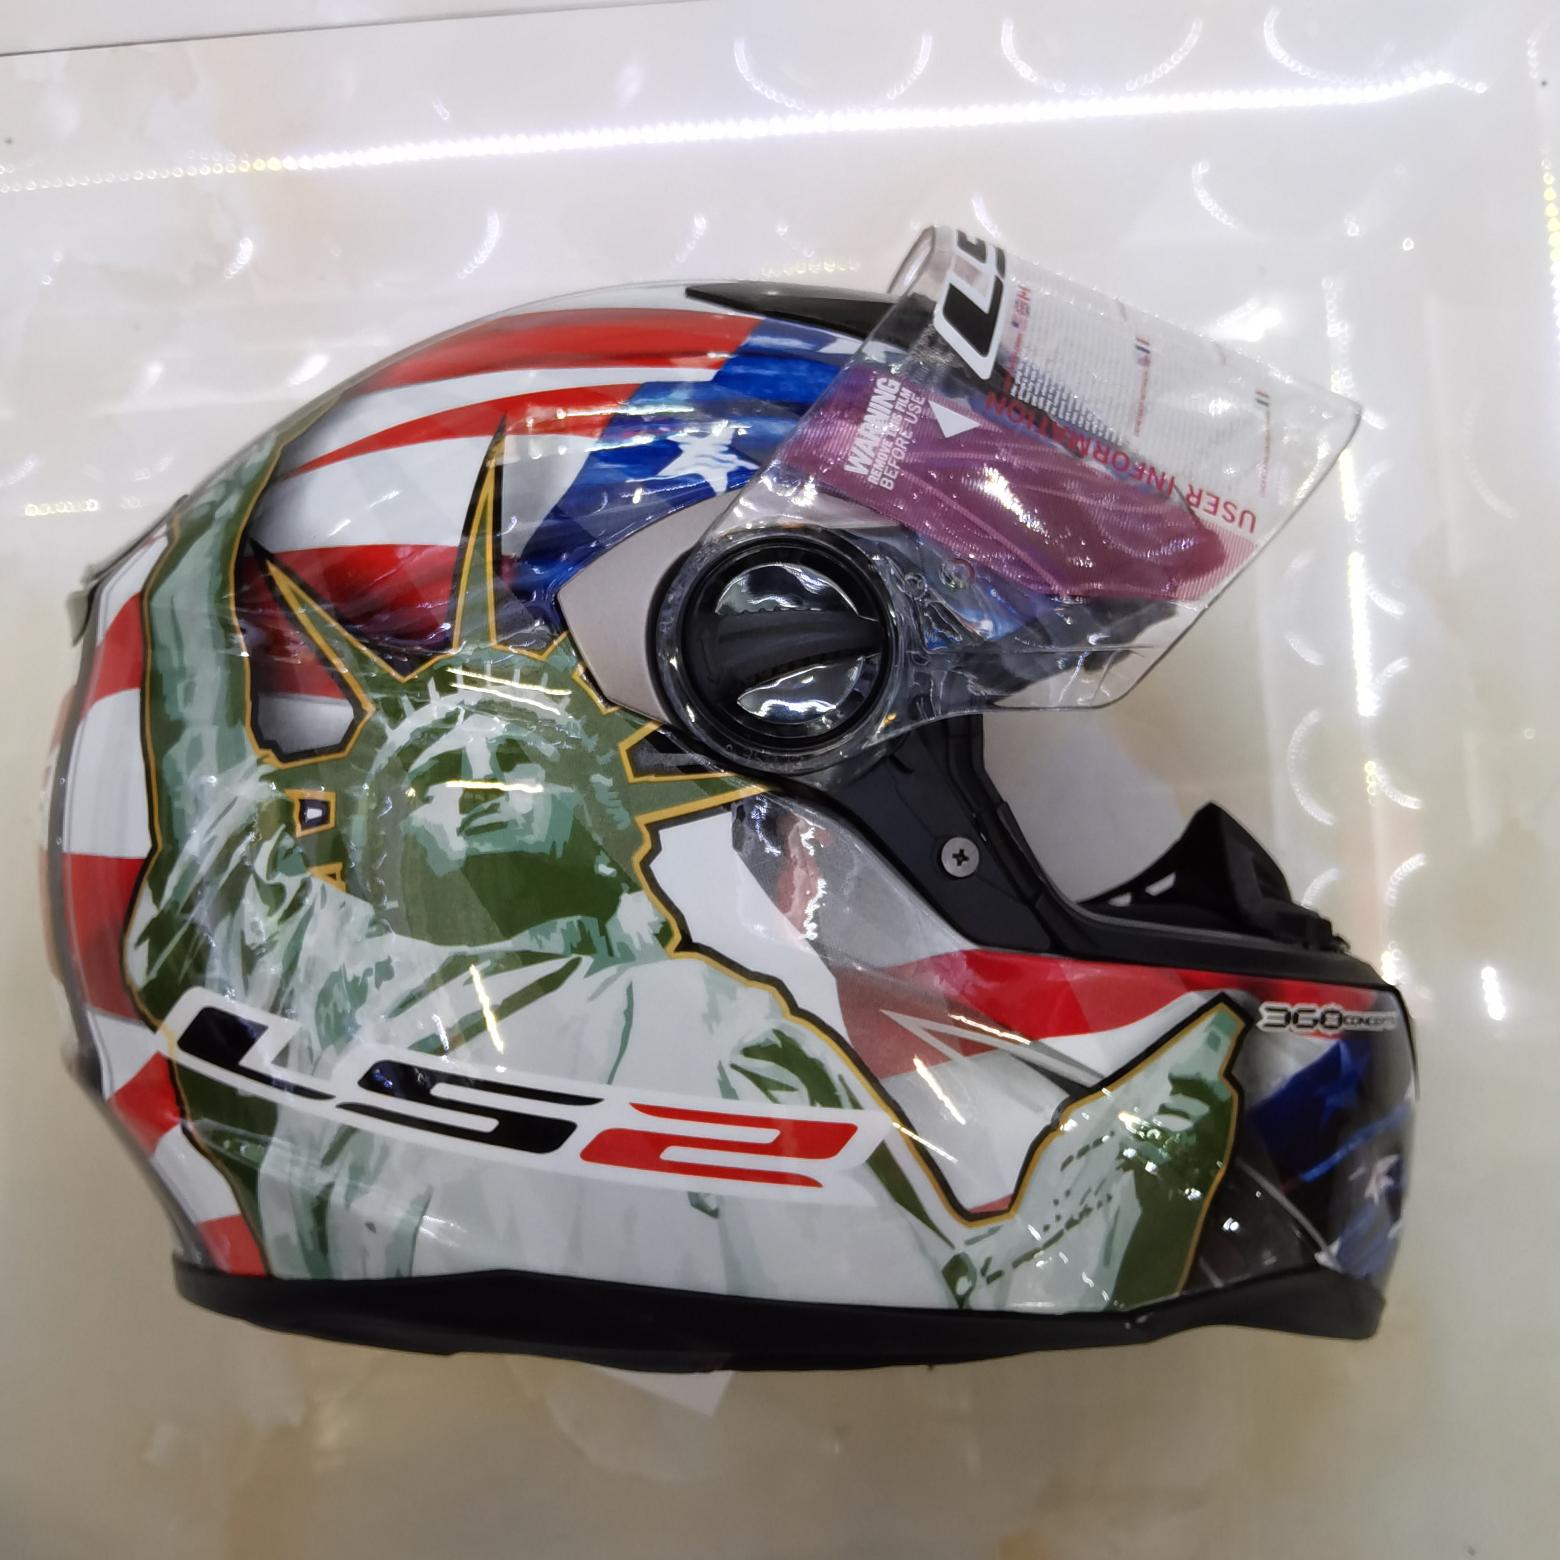 LS2品牌新款摩托车安全头盔机车电动车骑行专用头盔男女款跑盔防水透气轻便保暖四季款全覆式头盔